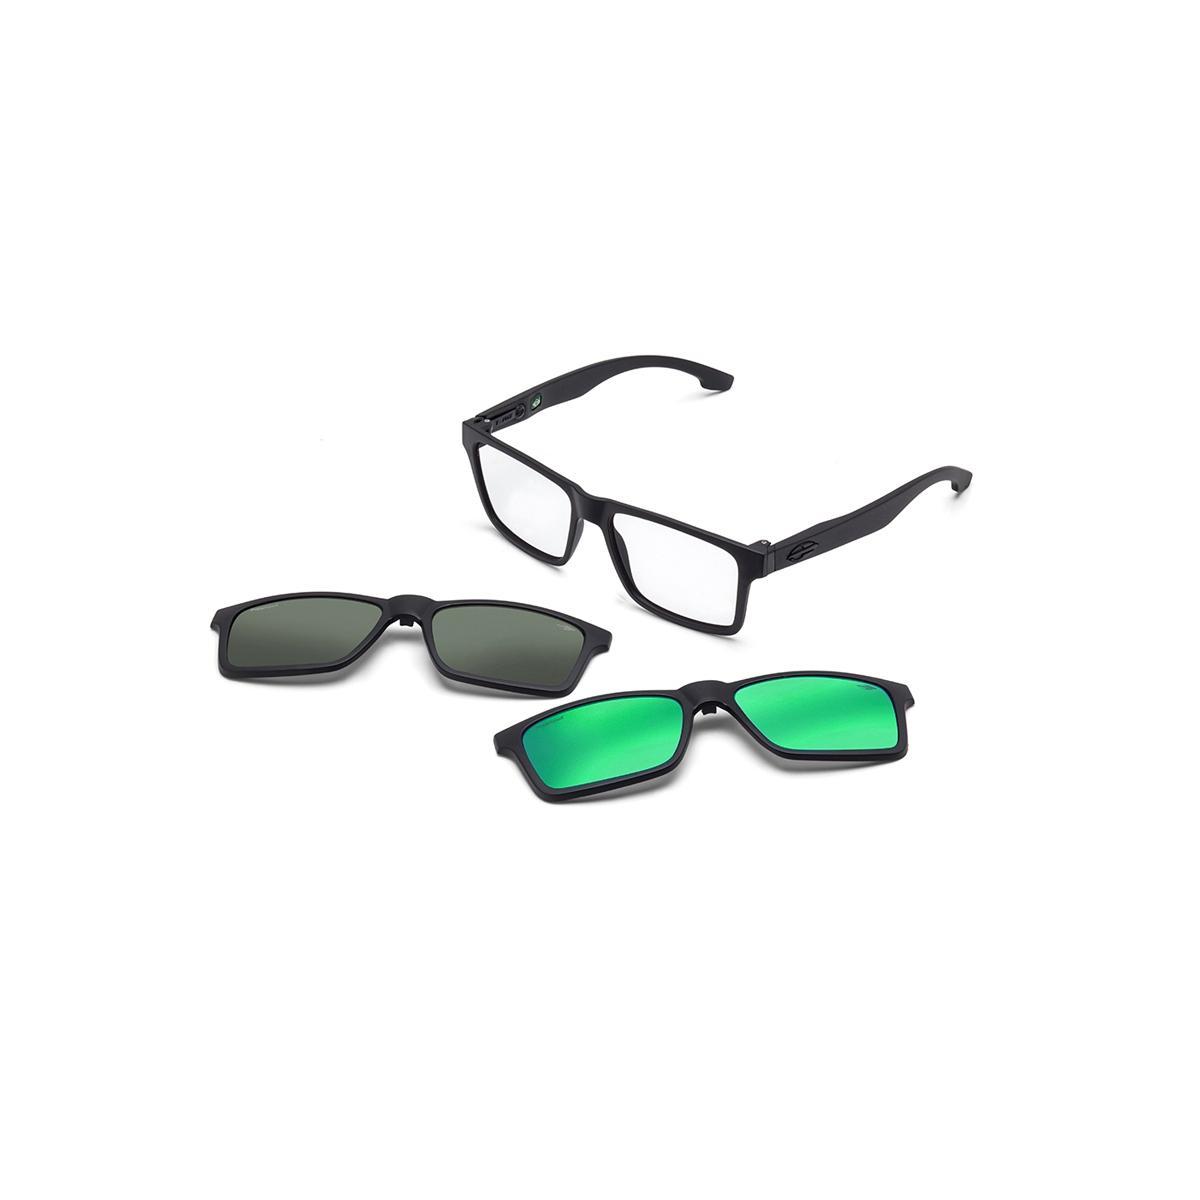 2b458b50f9580 Óculos de Sol Mormaii SWAP M6057 ACE 56 Preto Clip-On Lente Espelhada Verde  Cinza Tam 56 R  369